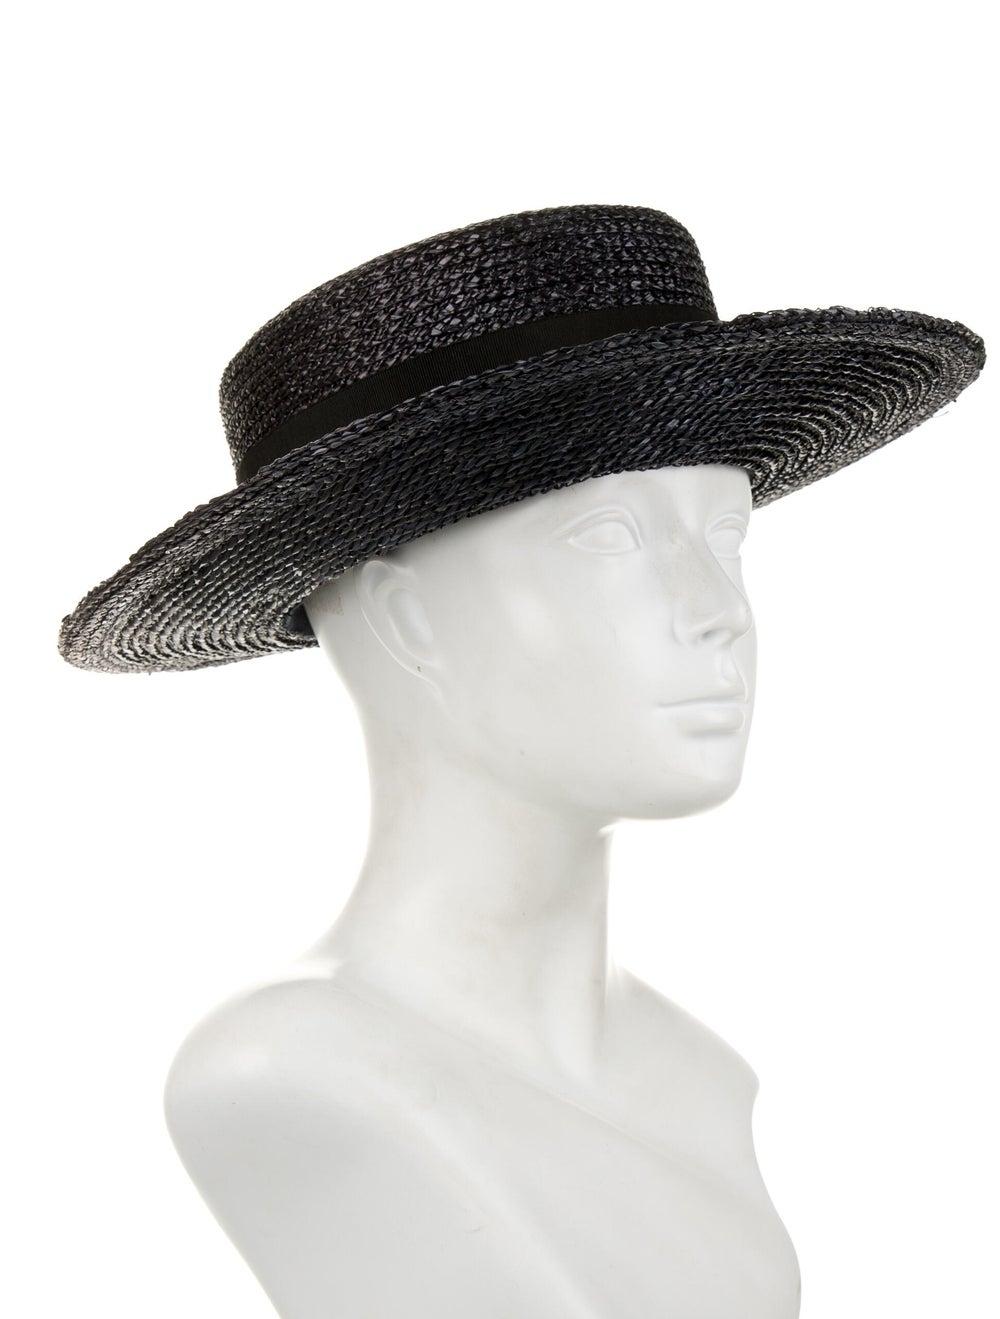 Chanel Straw Wide-Brim Sun Hat Black - image 3